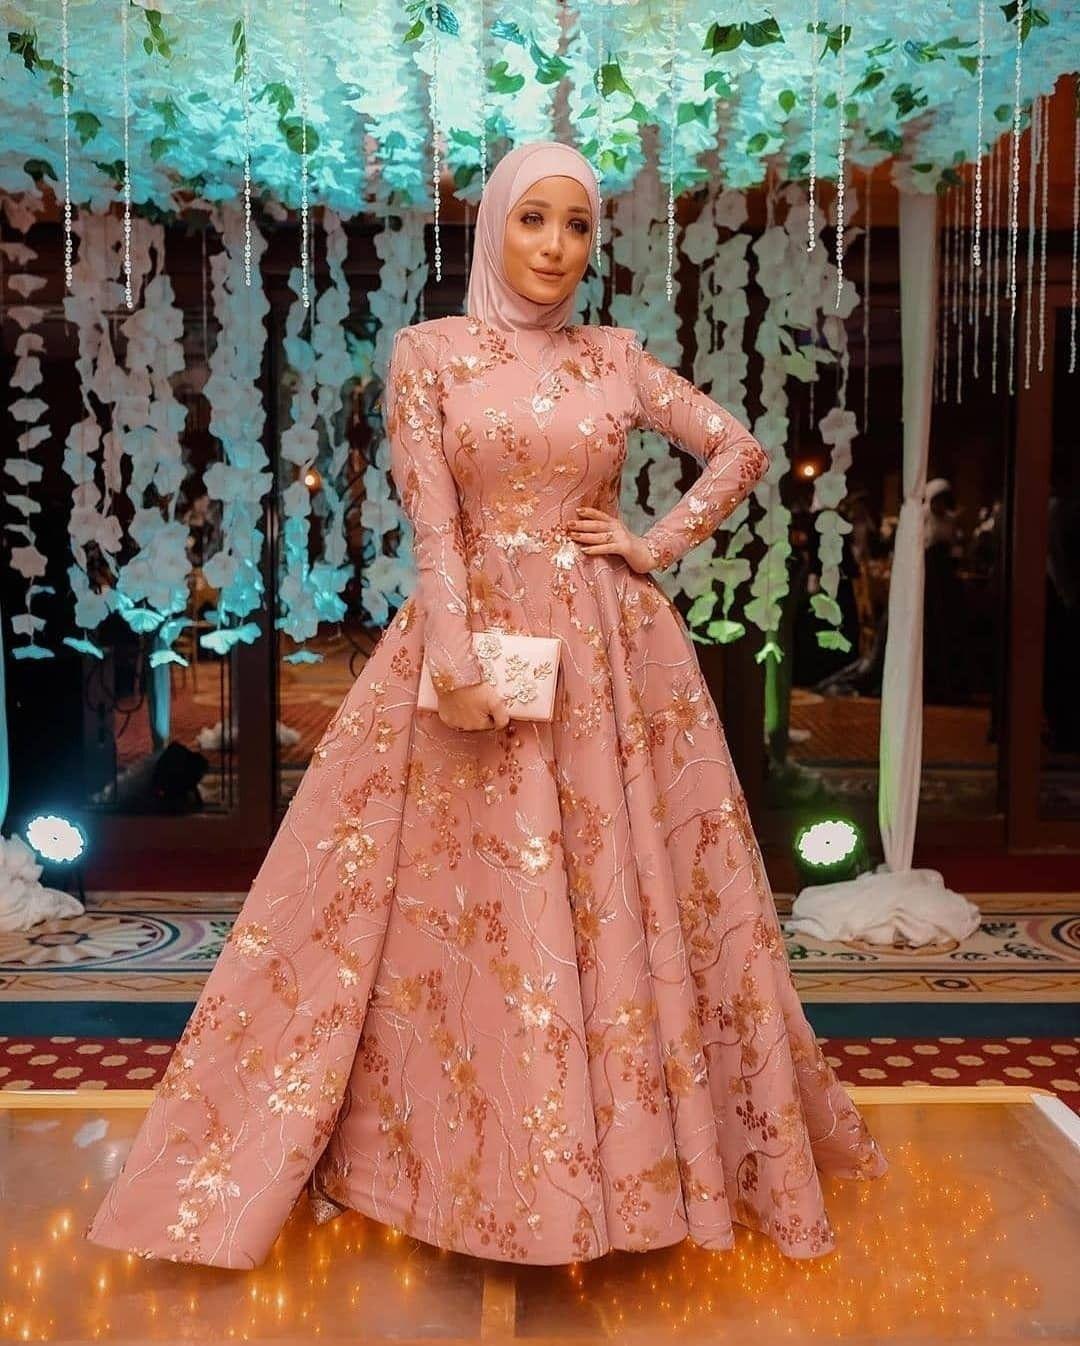 رايكم في الفستان شاهدي باقيه صور الفستان Muslimah Fashion Outfits Dresses Evening Dress Fashion